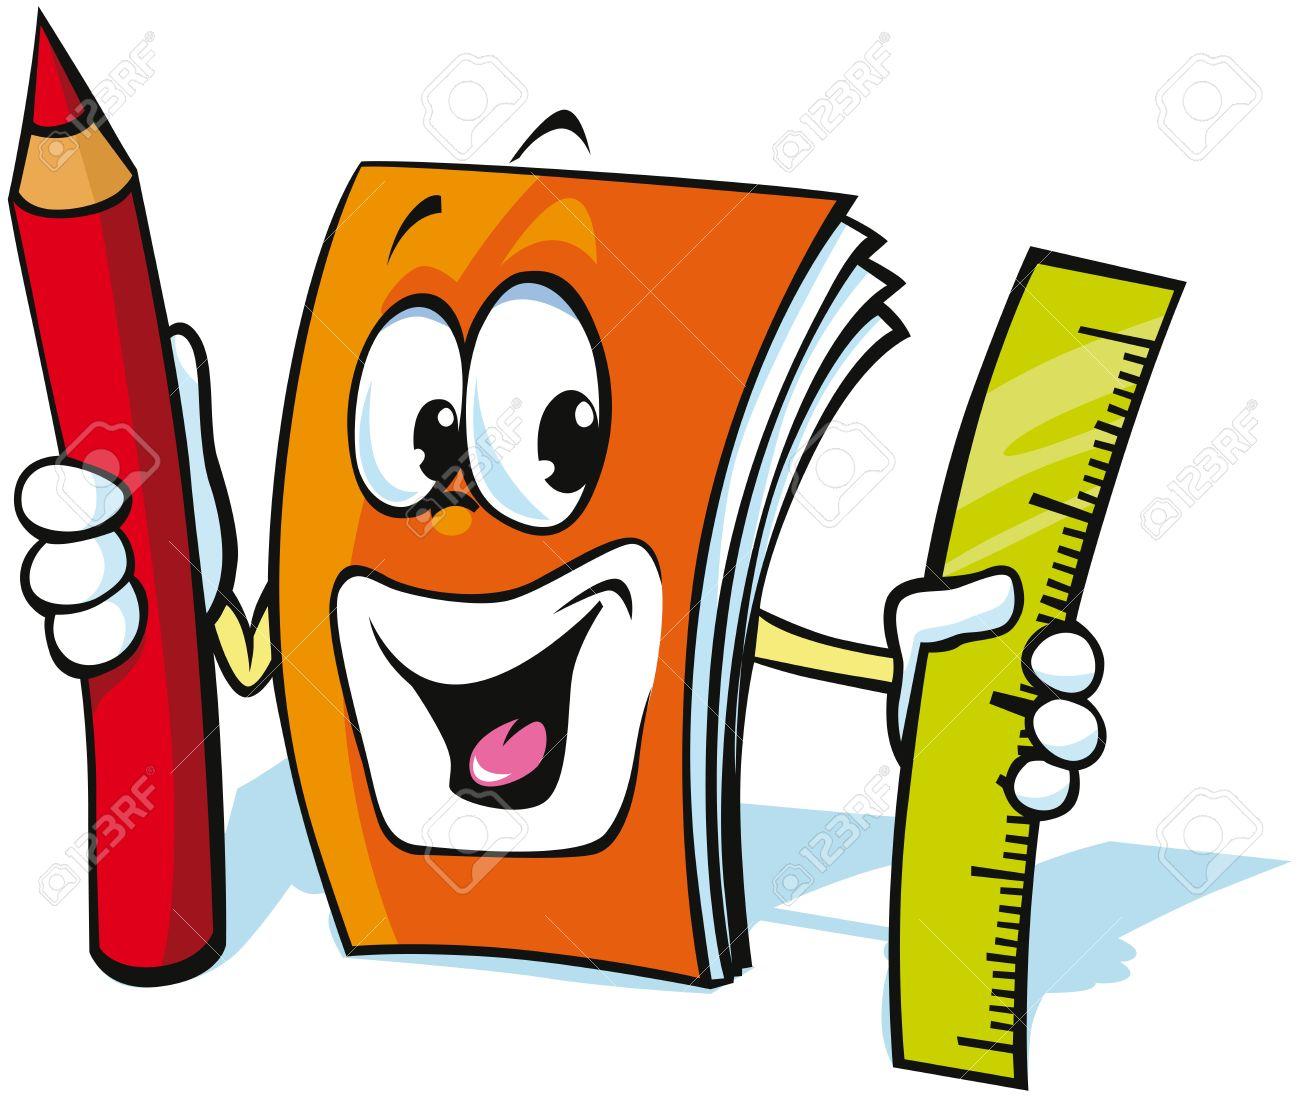 1300x1097 Funny Exercise Book Cartoon Royalty Free Cliparts, Vectors,